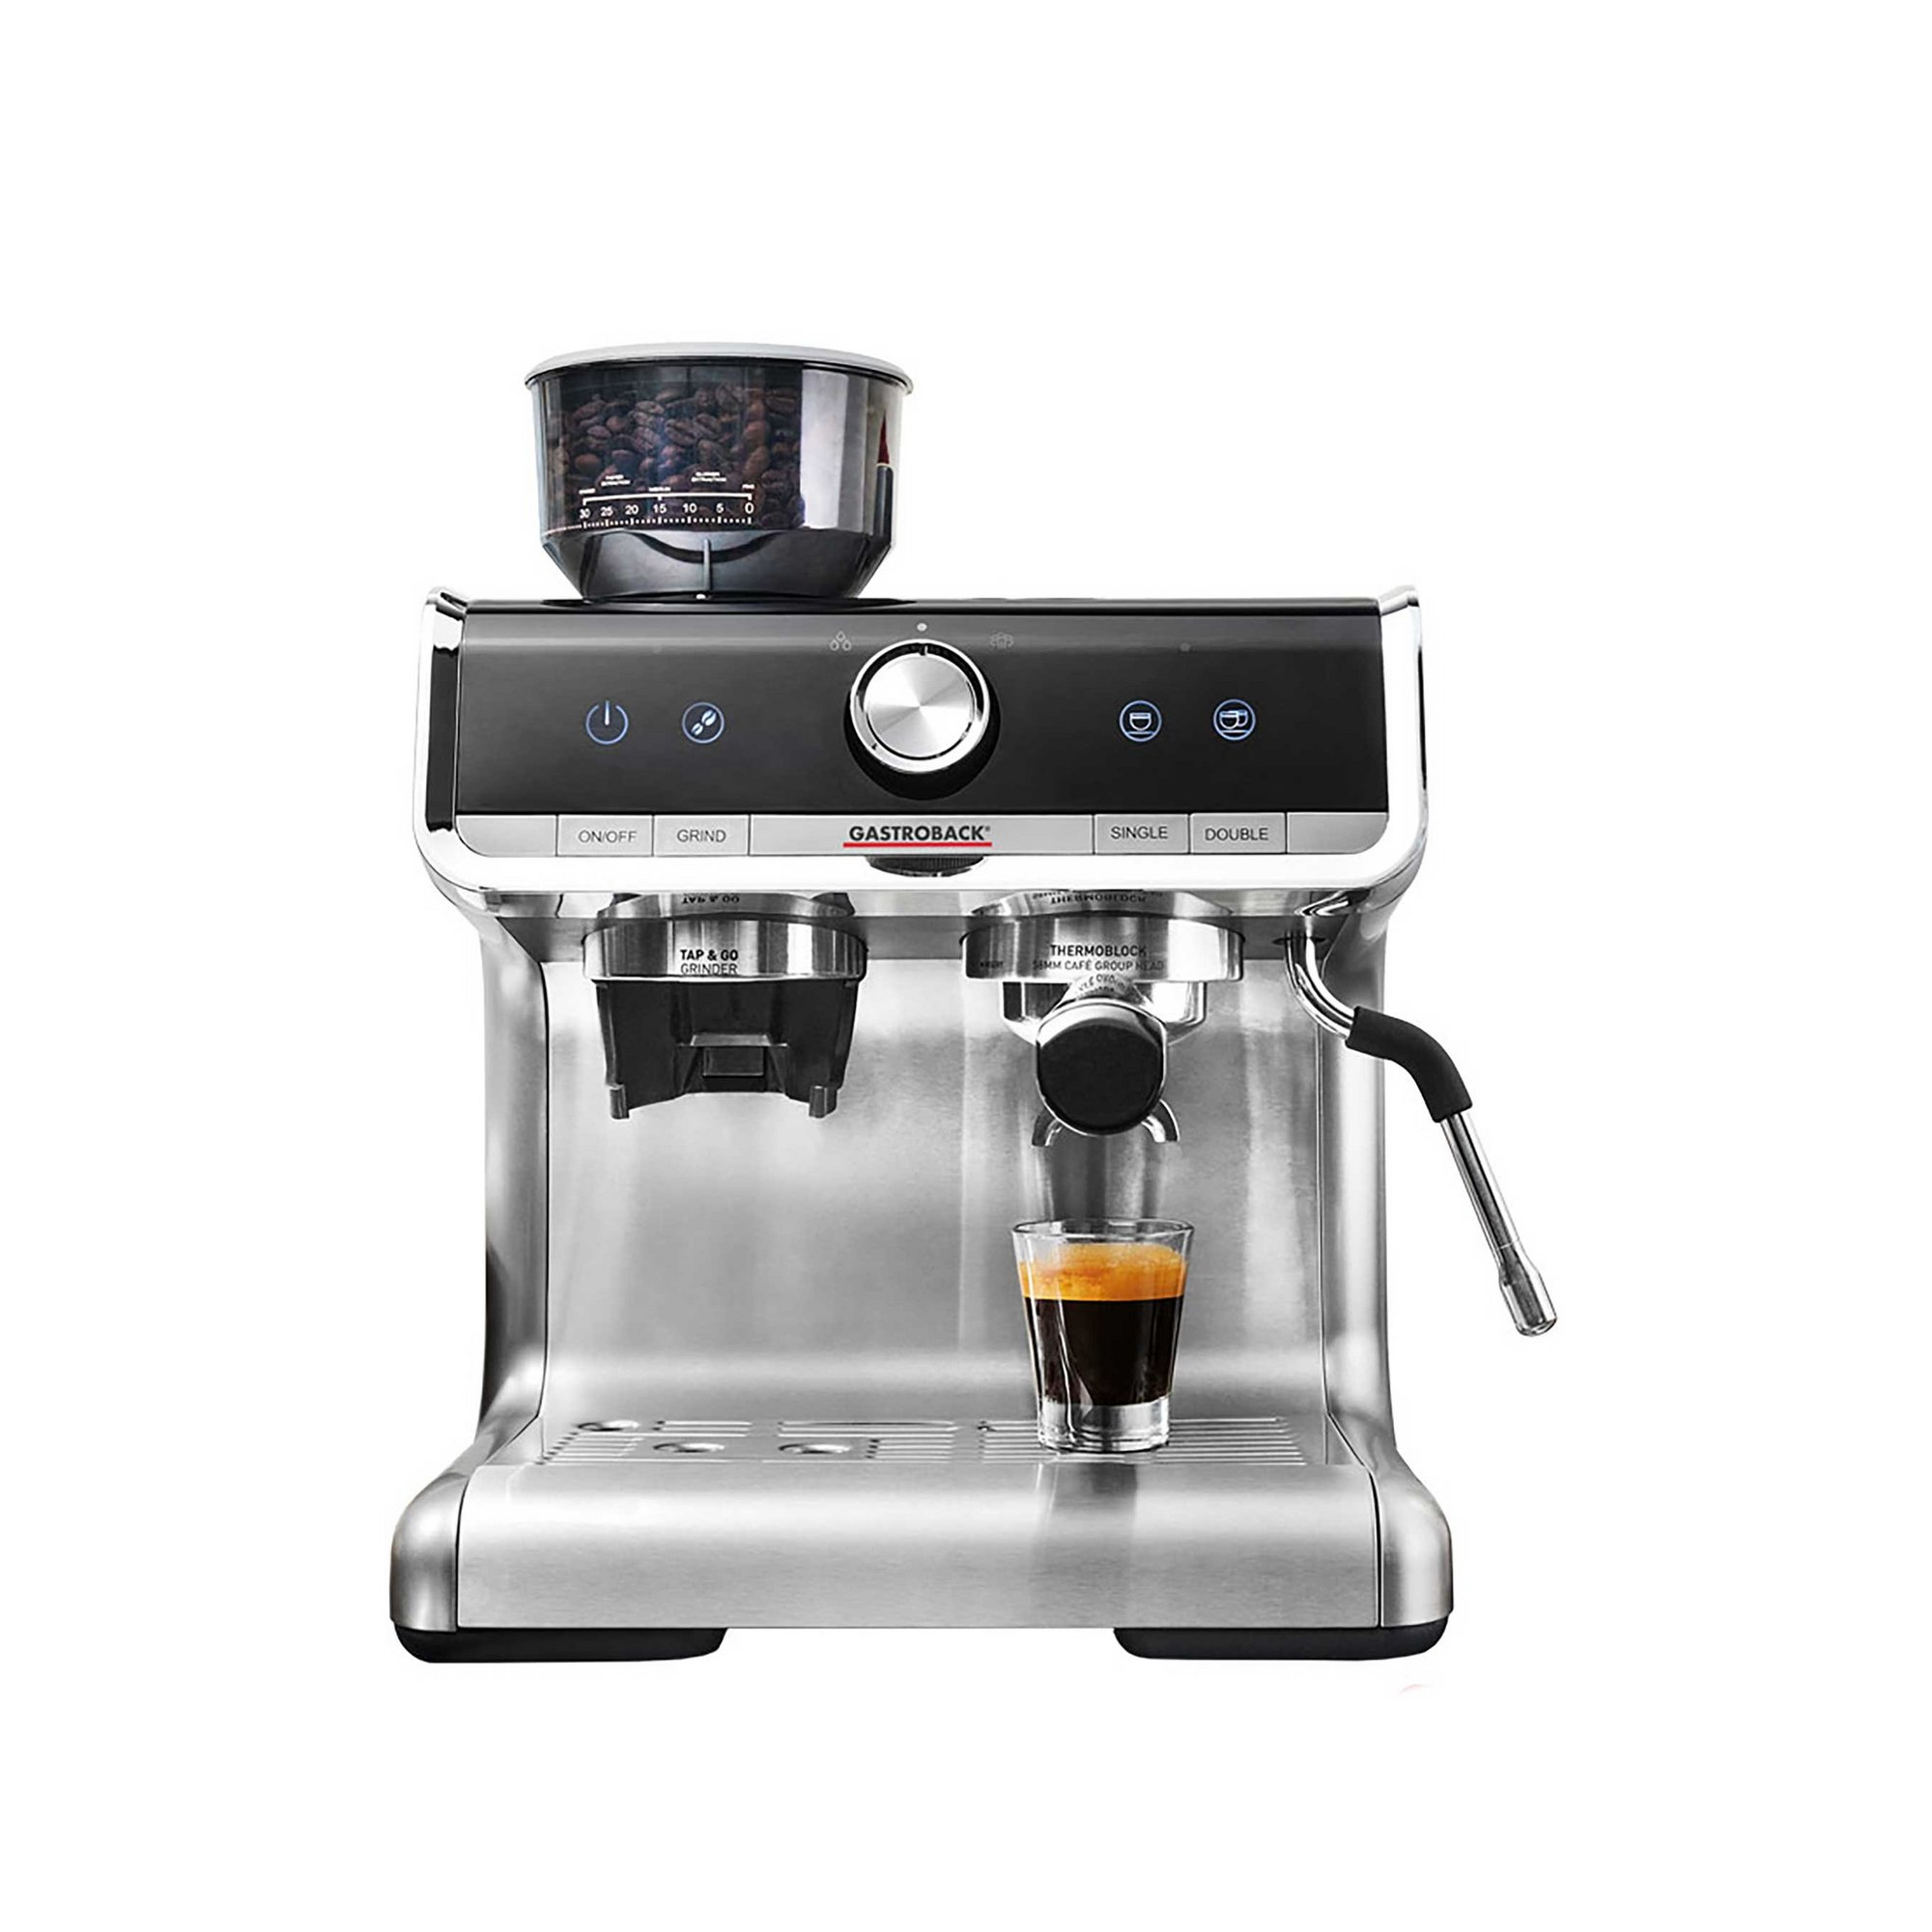 Image of Gastroback Design Barista Espresso Pro